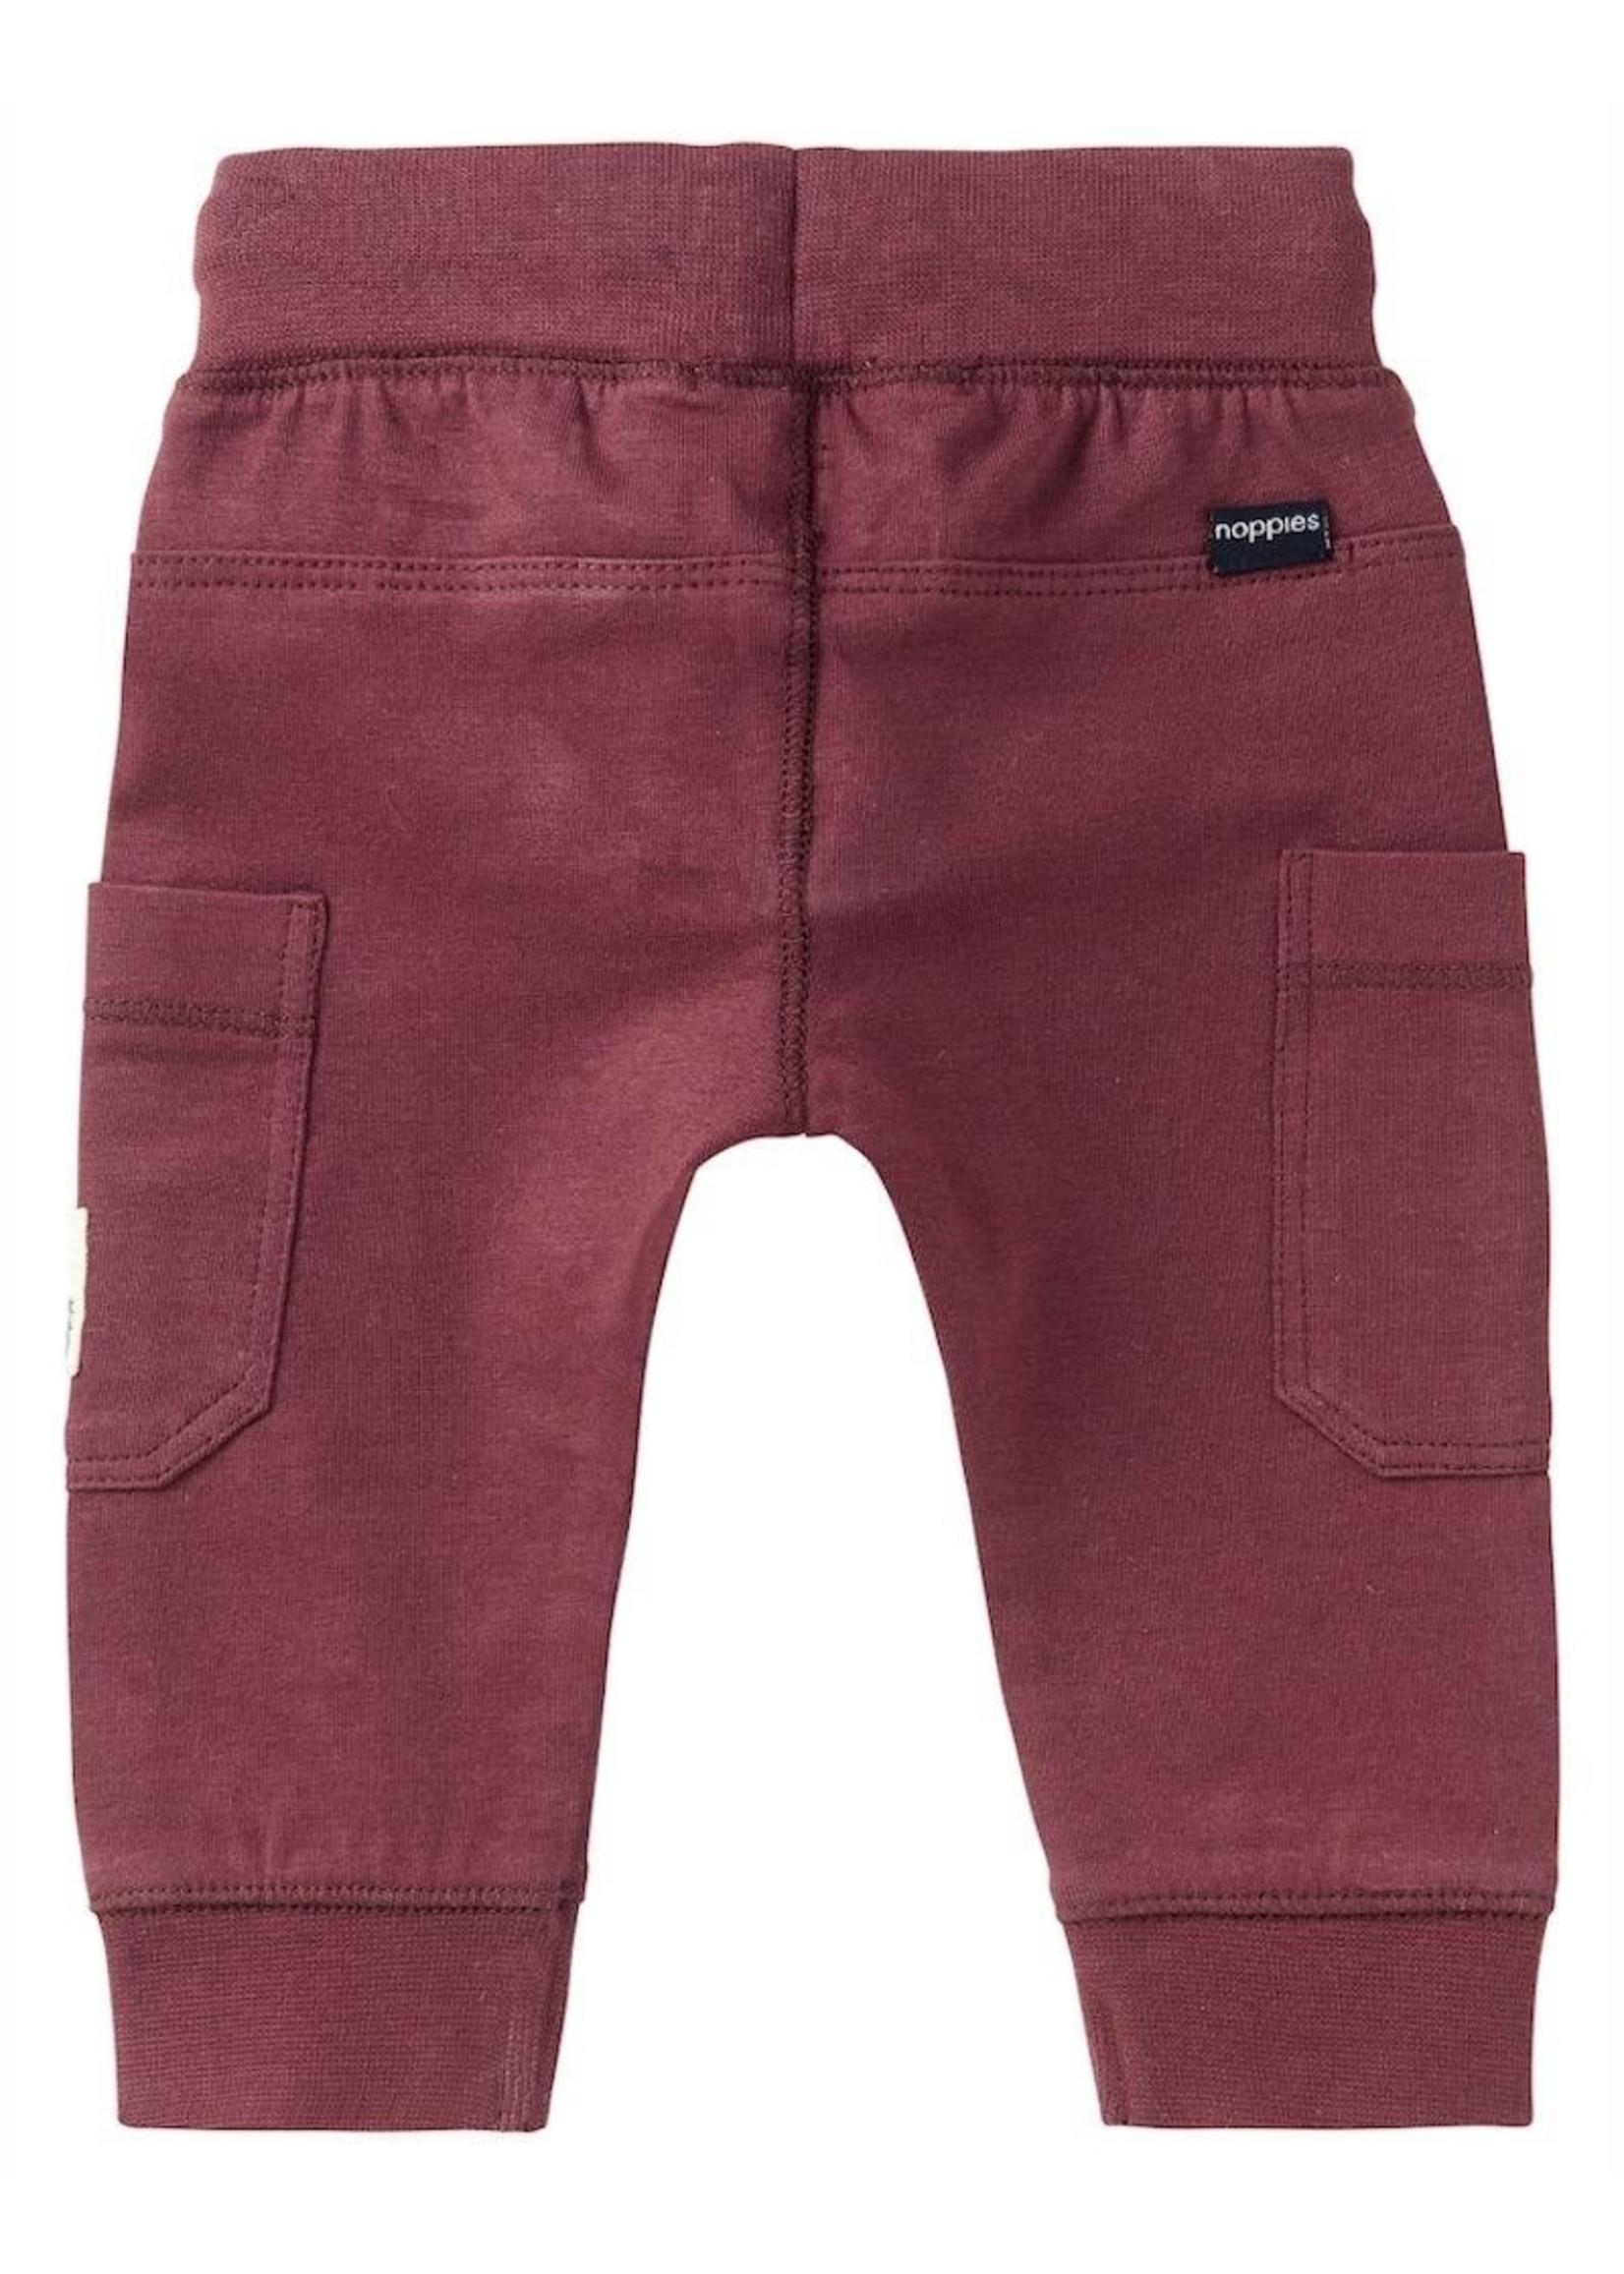 Noppies Kids Noppies Kids, Venterstad Baby Boy's Sweatpants in Dusty Red